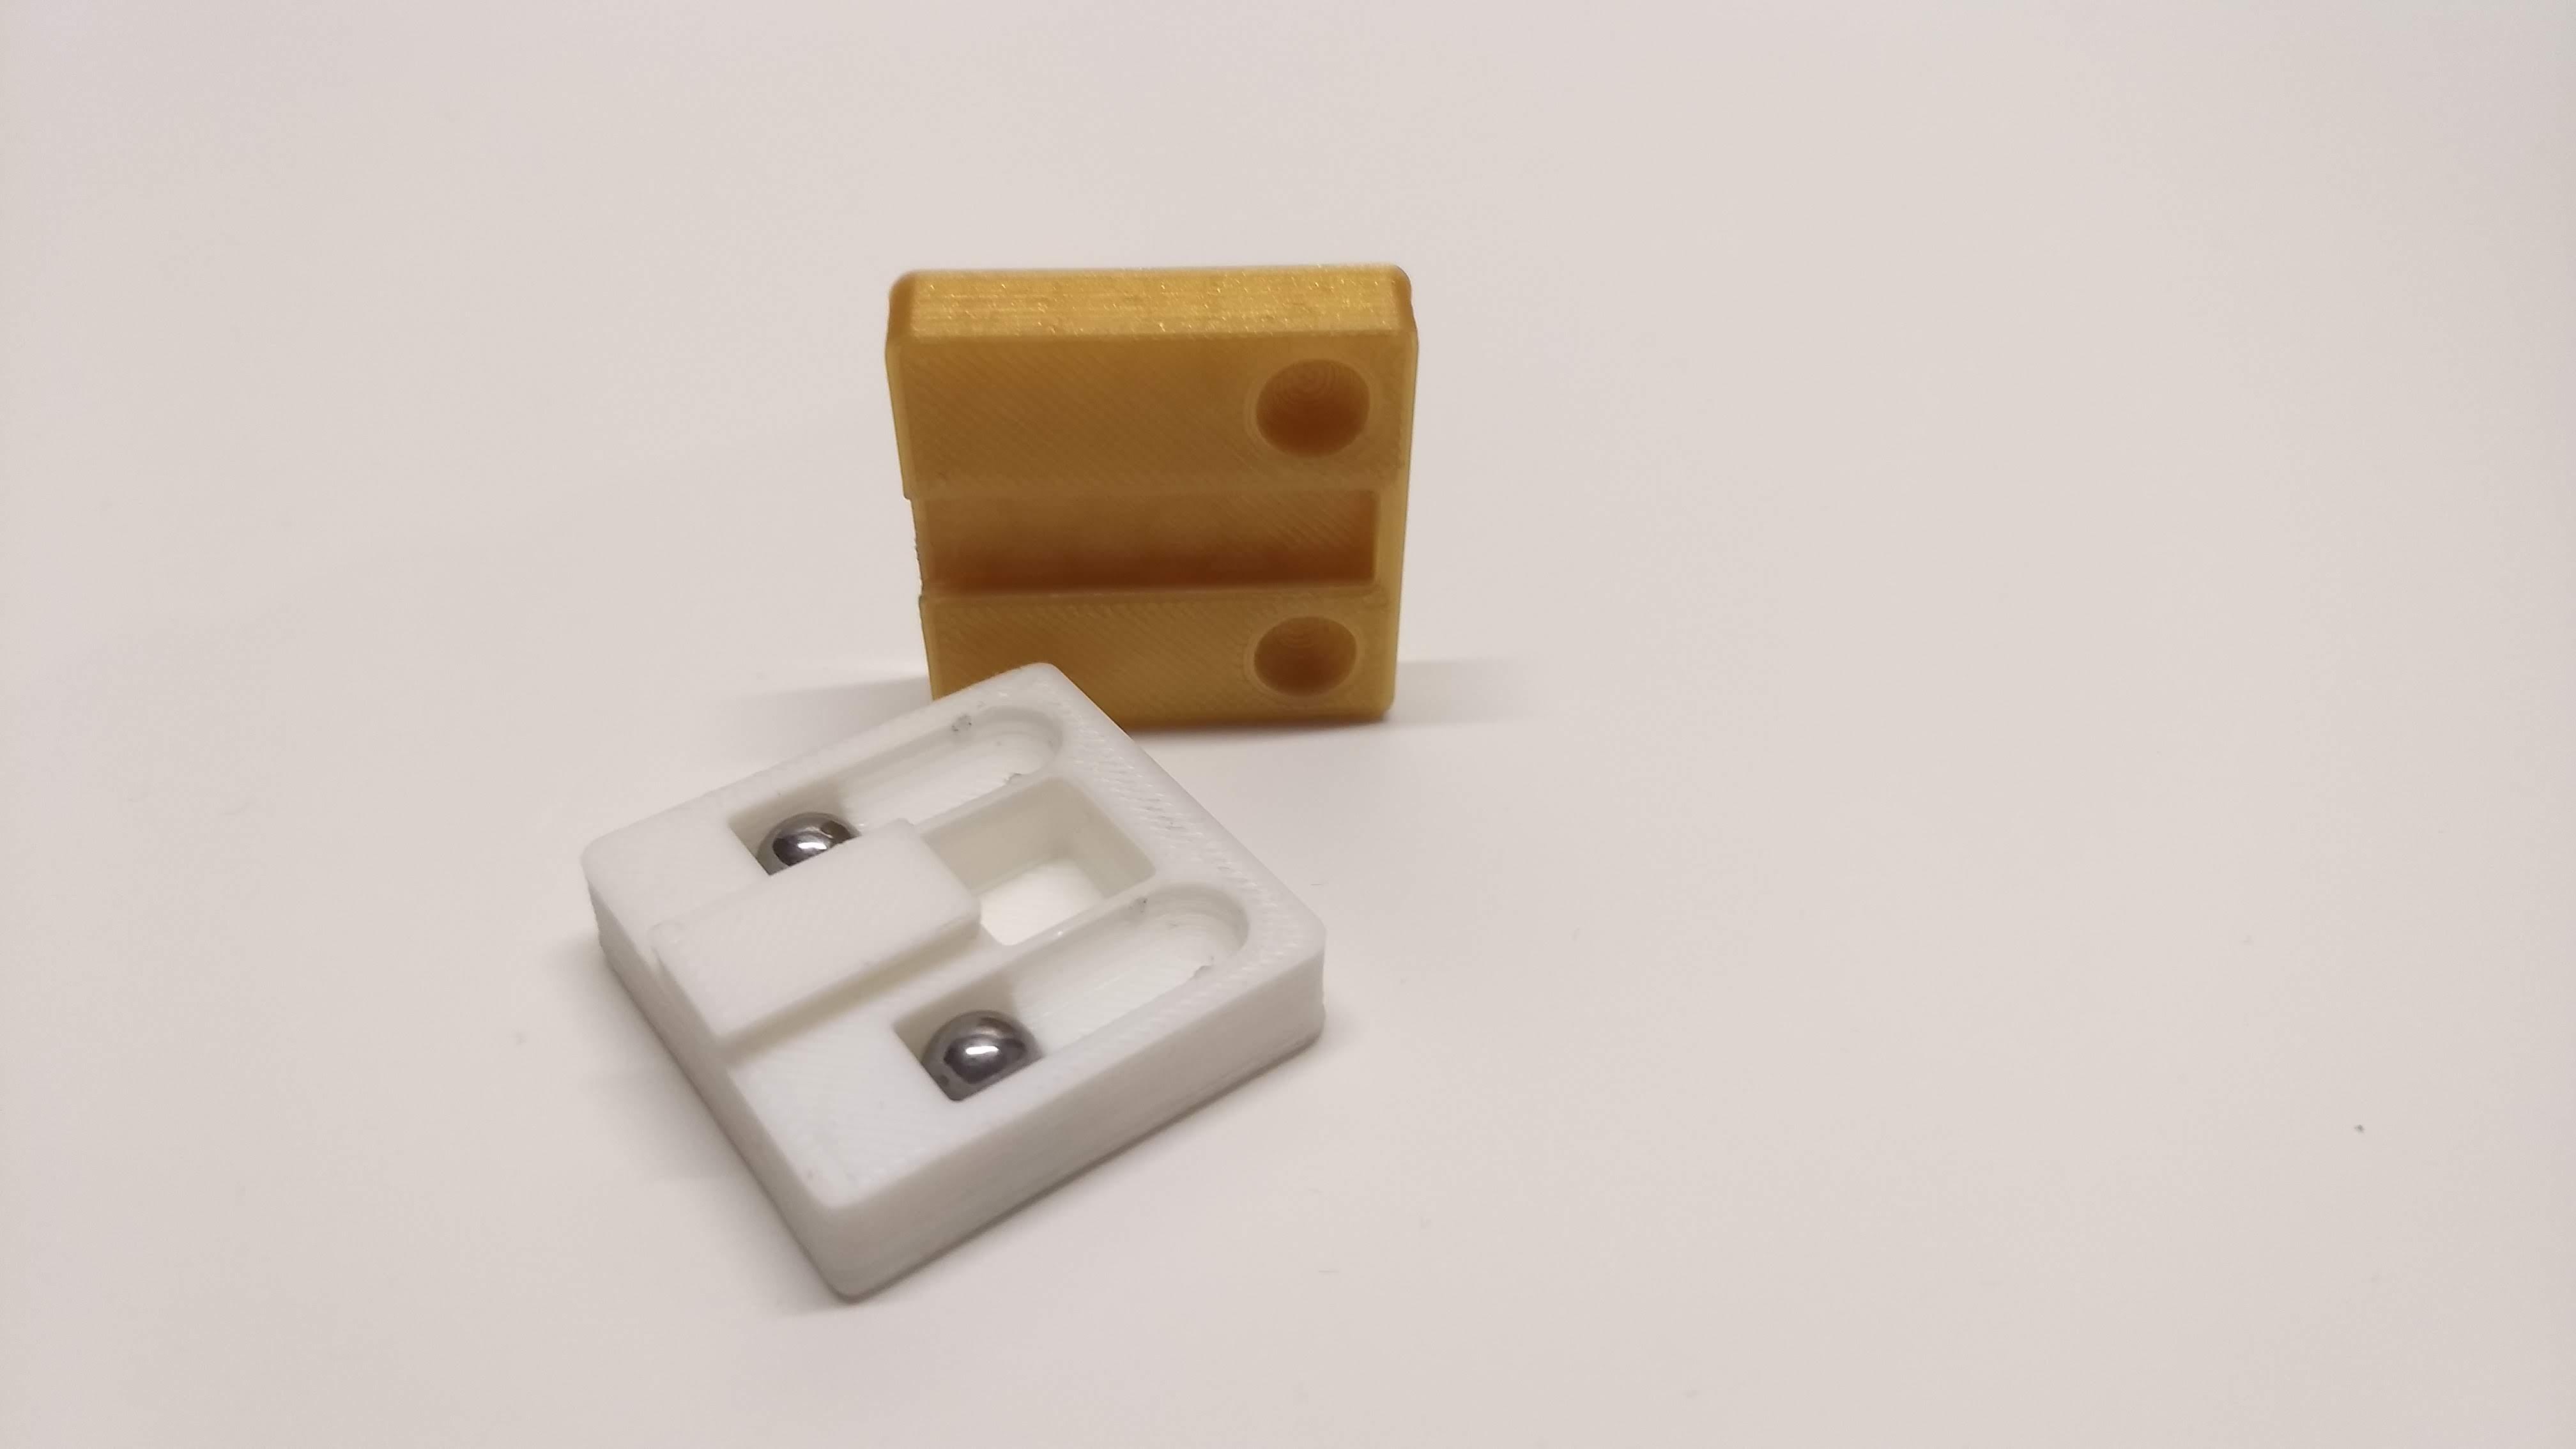 IMG_20191103_180040347.jpg Download free STL file Small Puzzle Box • 3D printer object, EL3D